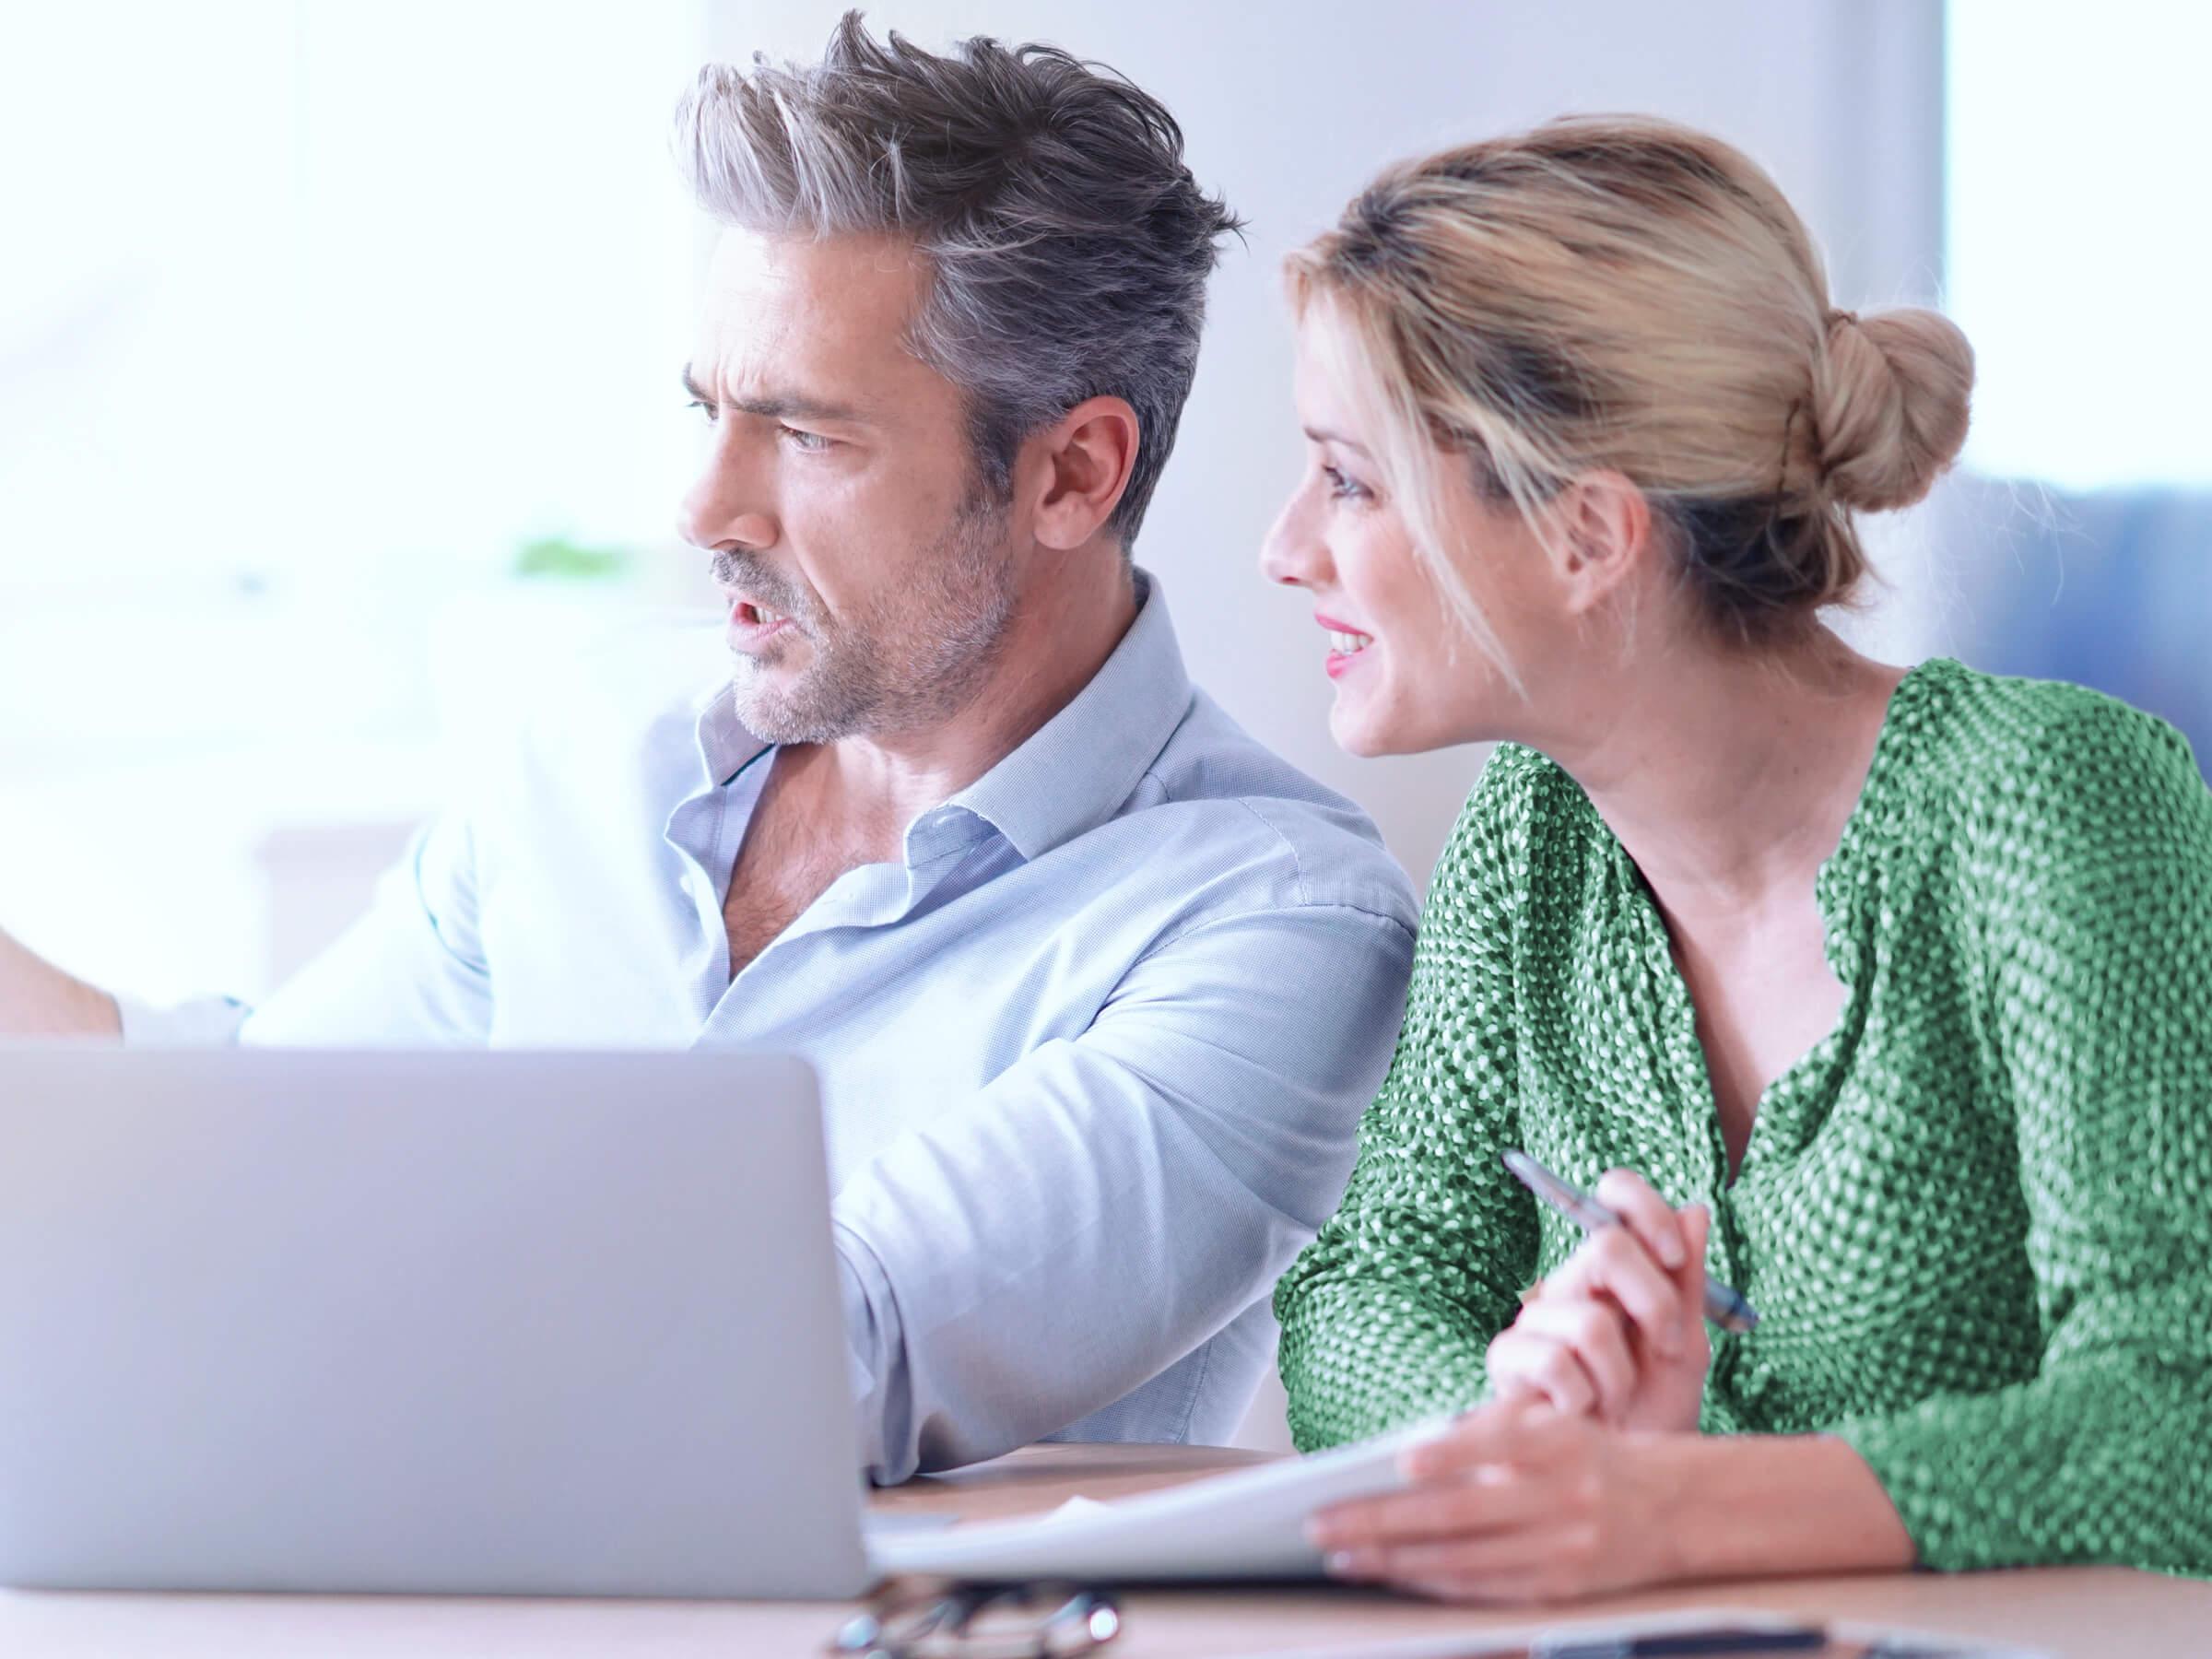 Investoři a klienti online brokera LYNX porovnávají nízké spready na devizovém trhu